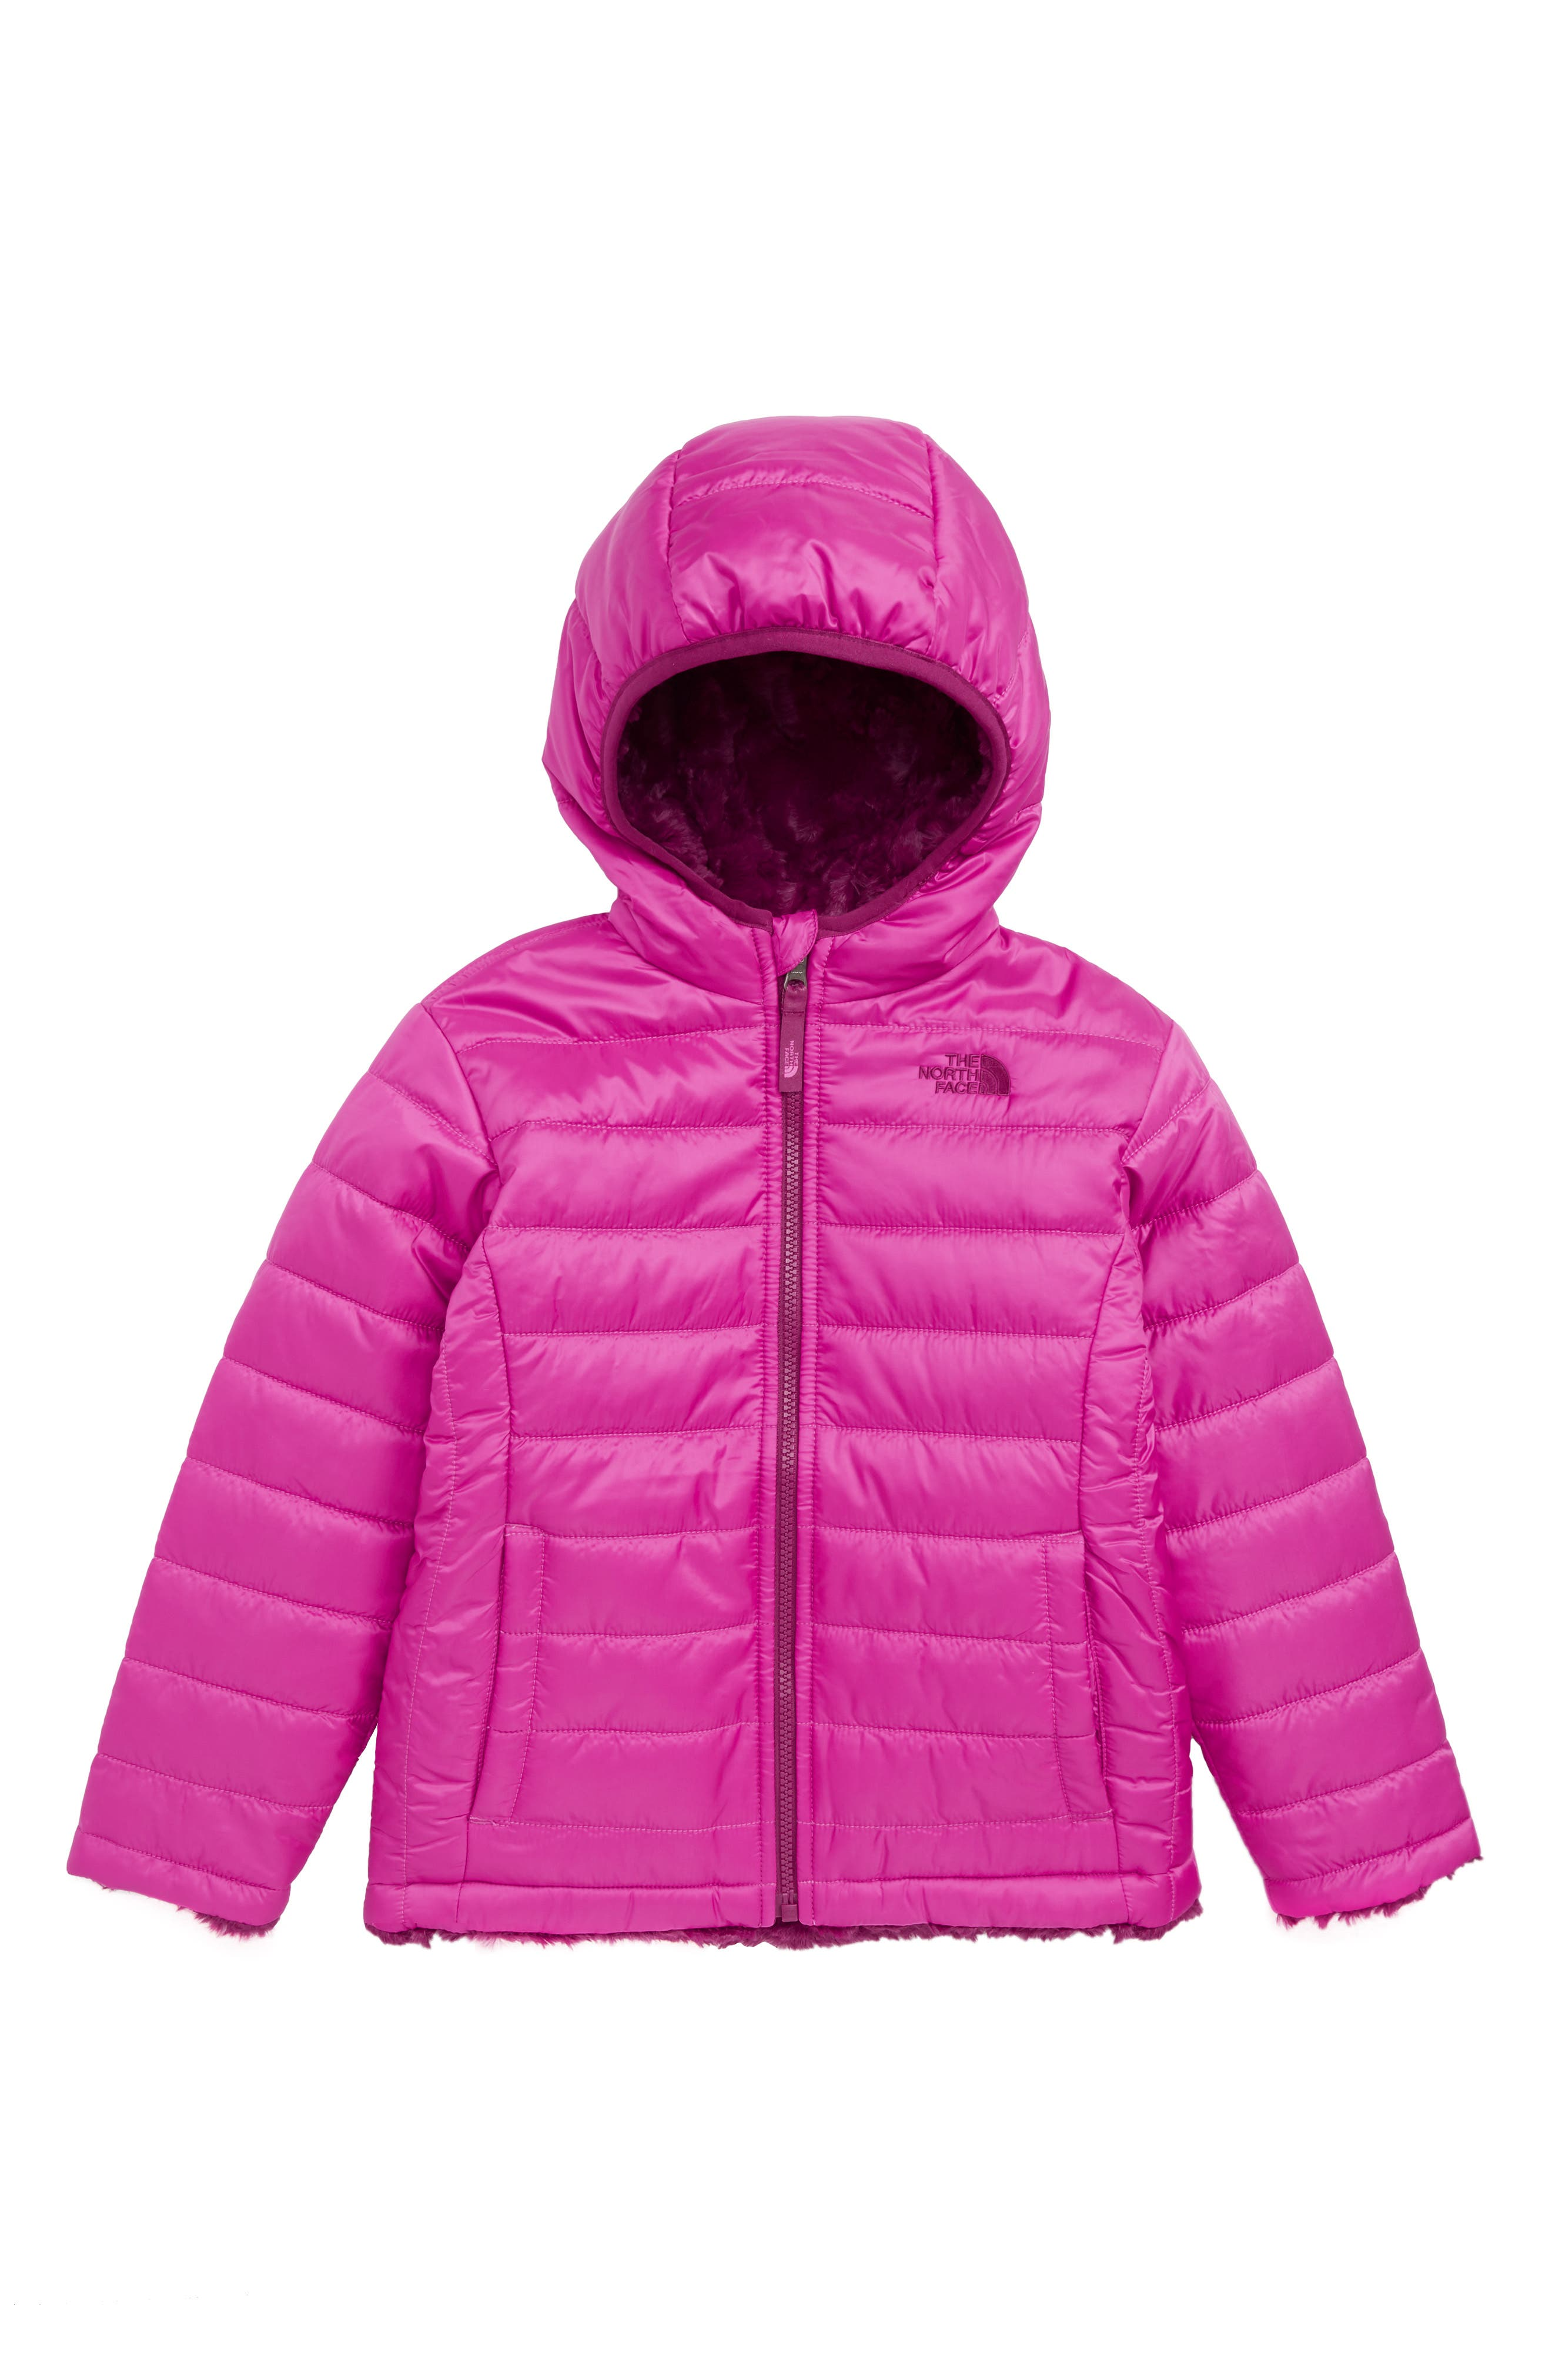 Mossbud Swirl Insulated Reversible Jacket,                         Main,                         color, AZALEA PINK/ DRAMATIC PLUM